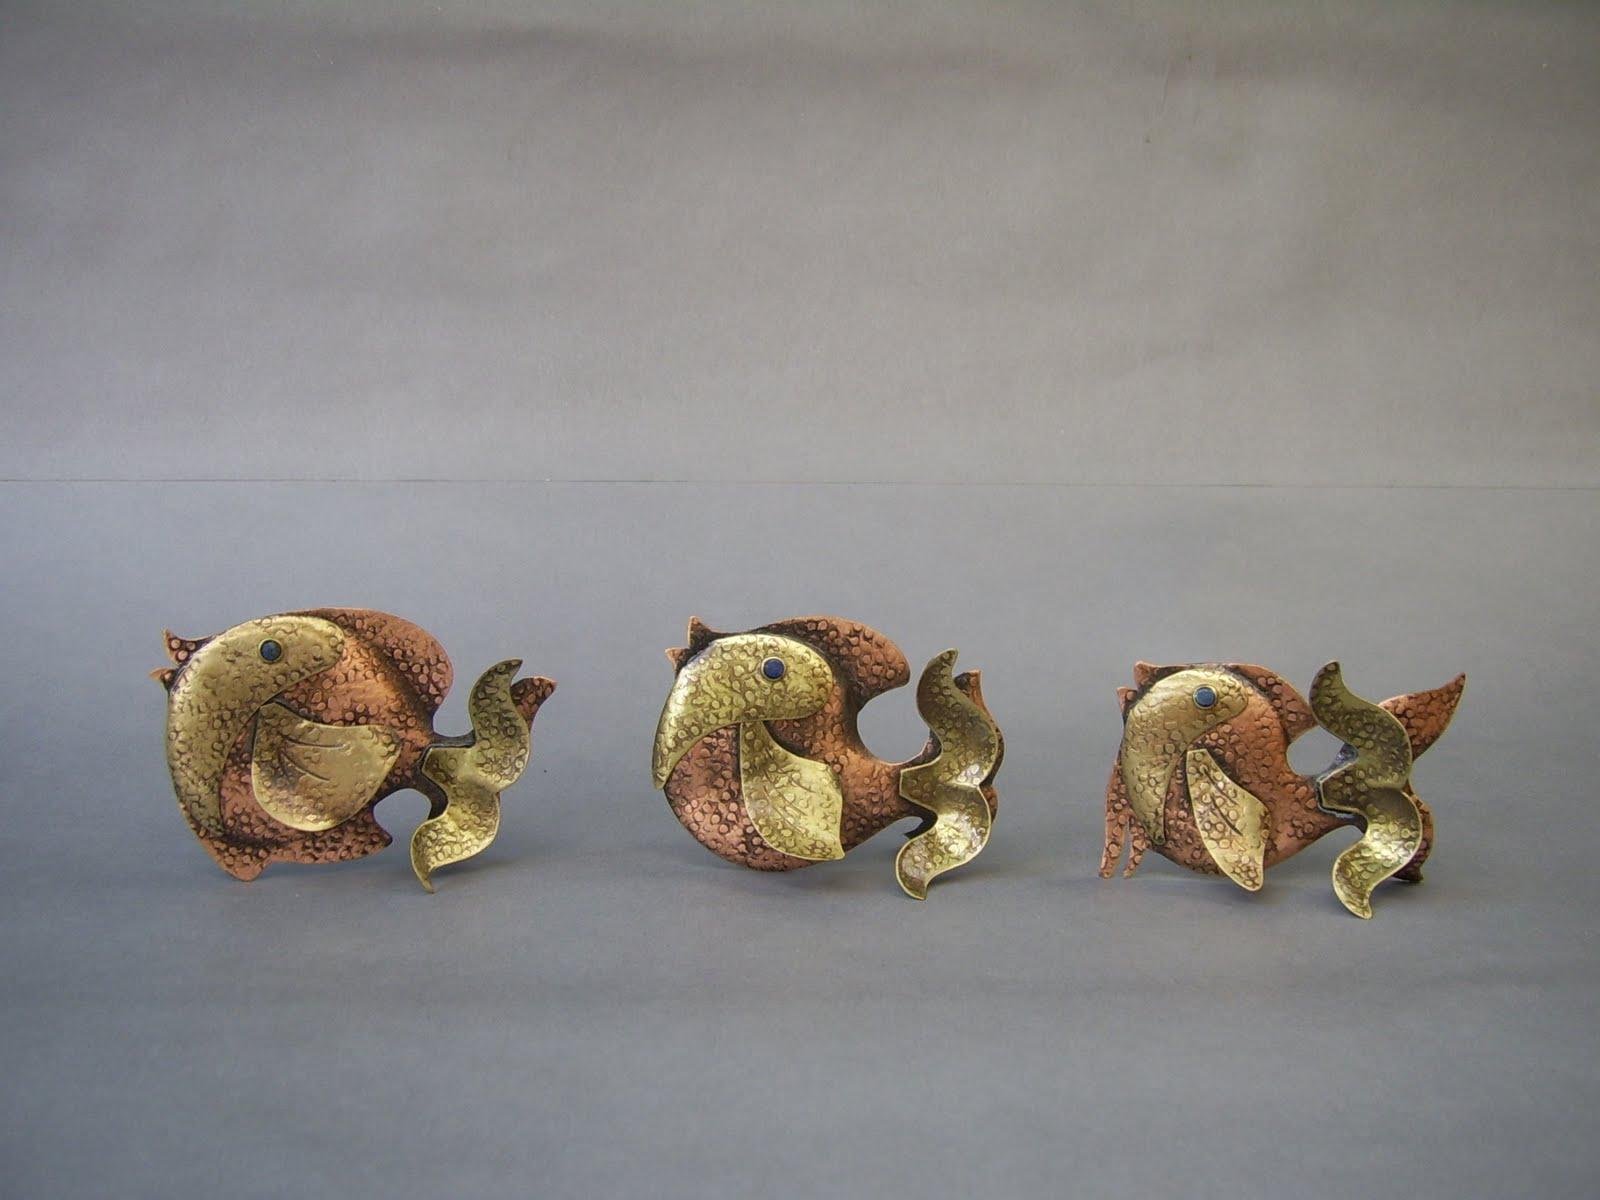 Artesanias en cobre objetos de cobre - Objetos de cobre ...